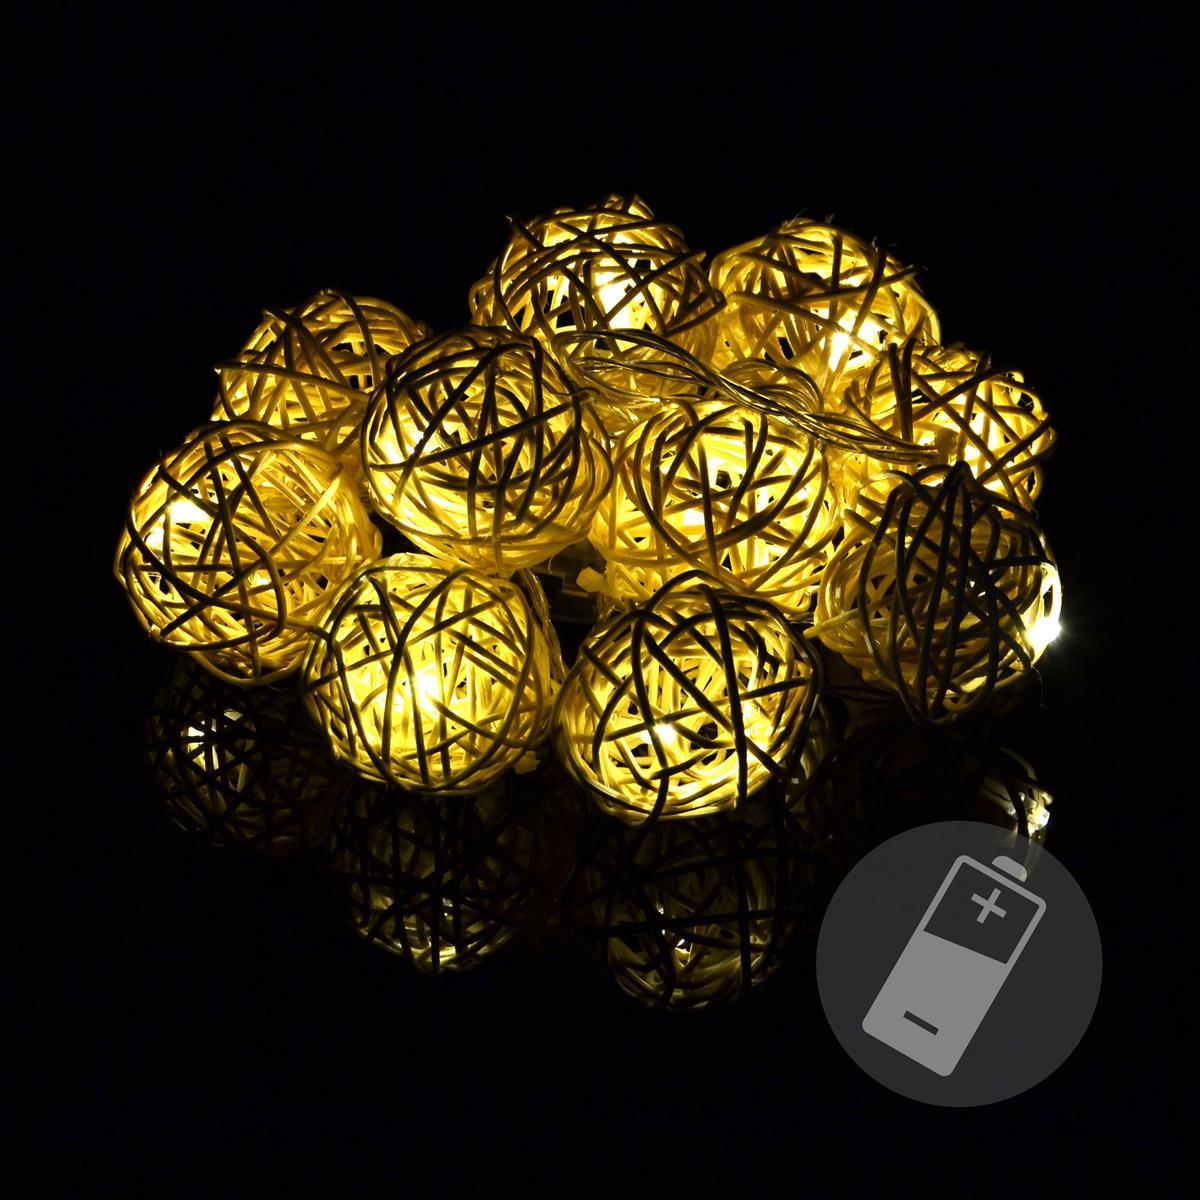 2er Set 10 LED Lichterkette Ball in Rattanoptik Lichterkette warmweiß Batterie